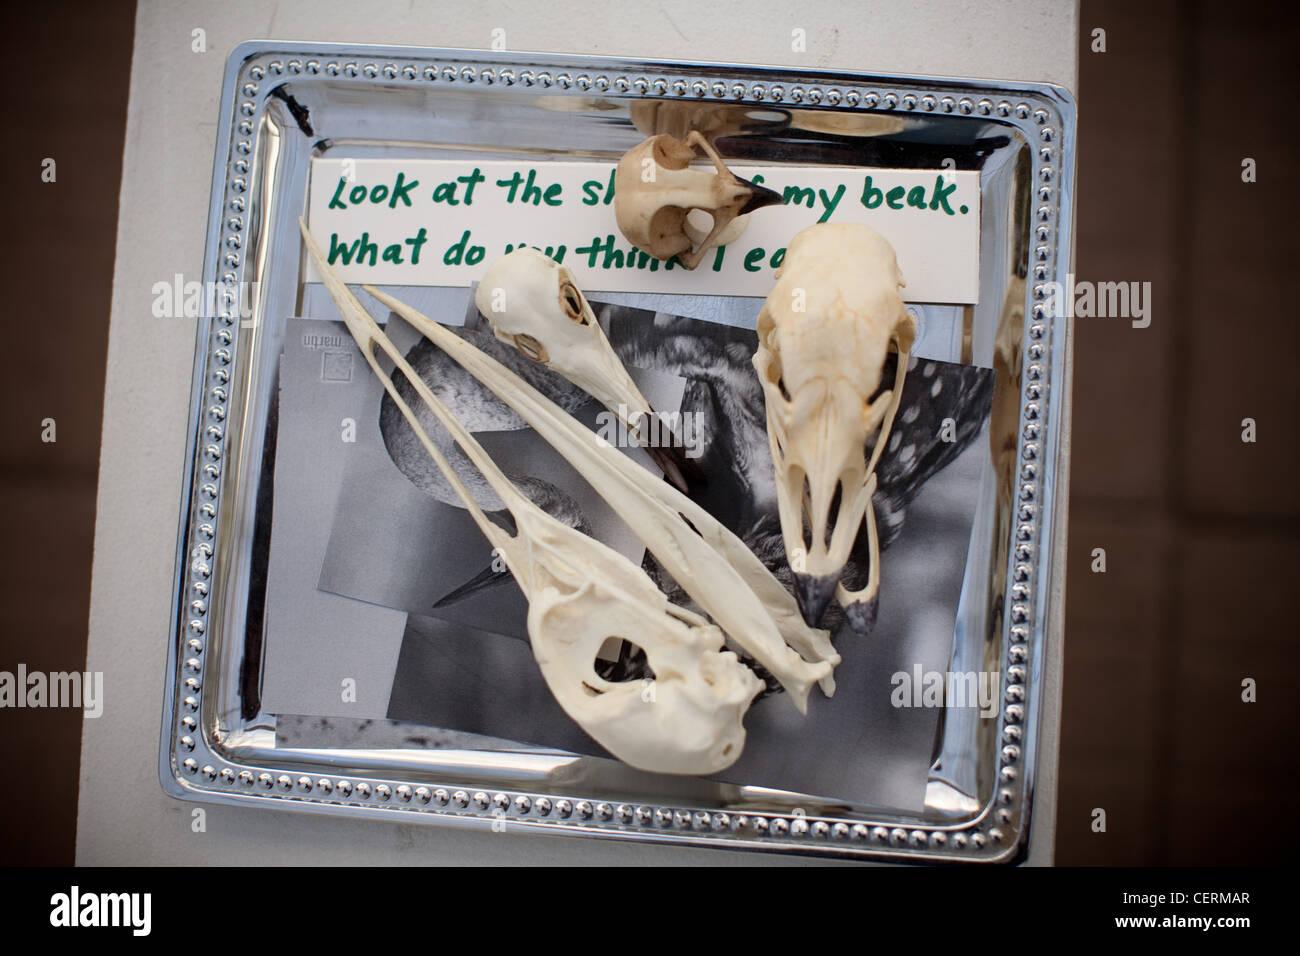 Bird skulls displayed in an elementary science classroom - Stock Image